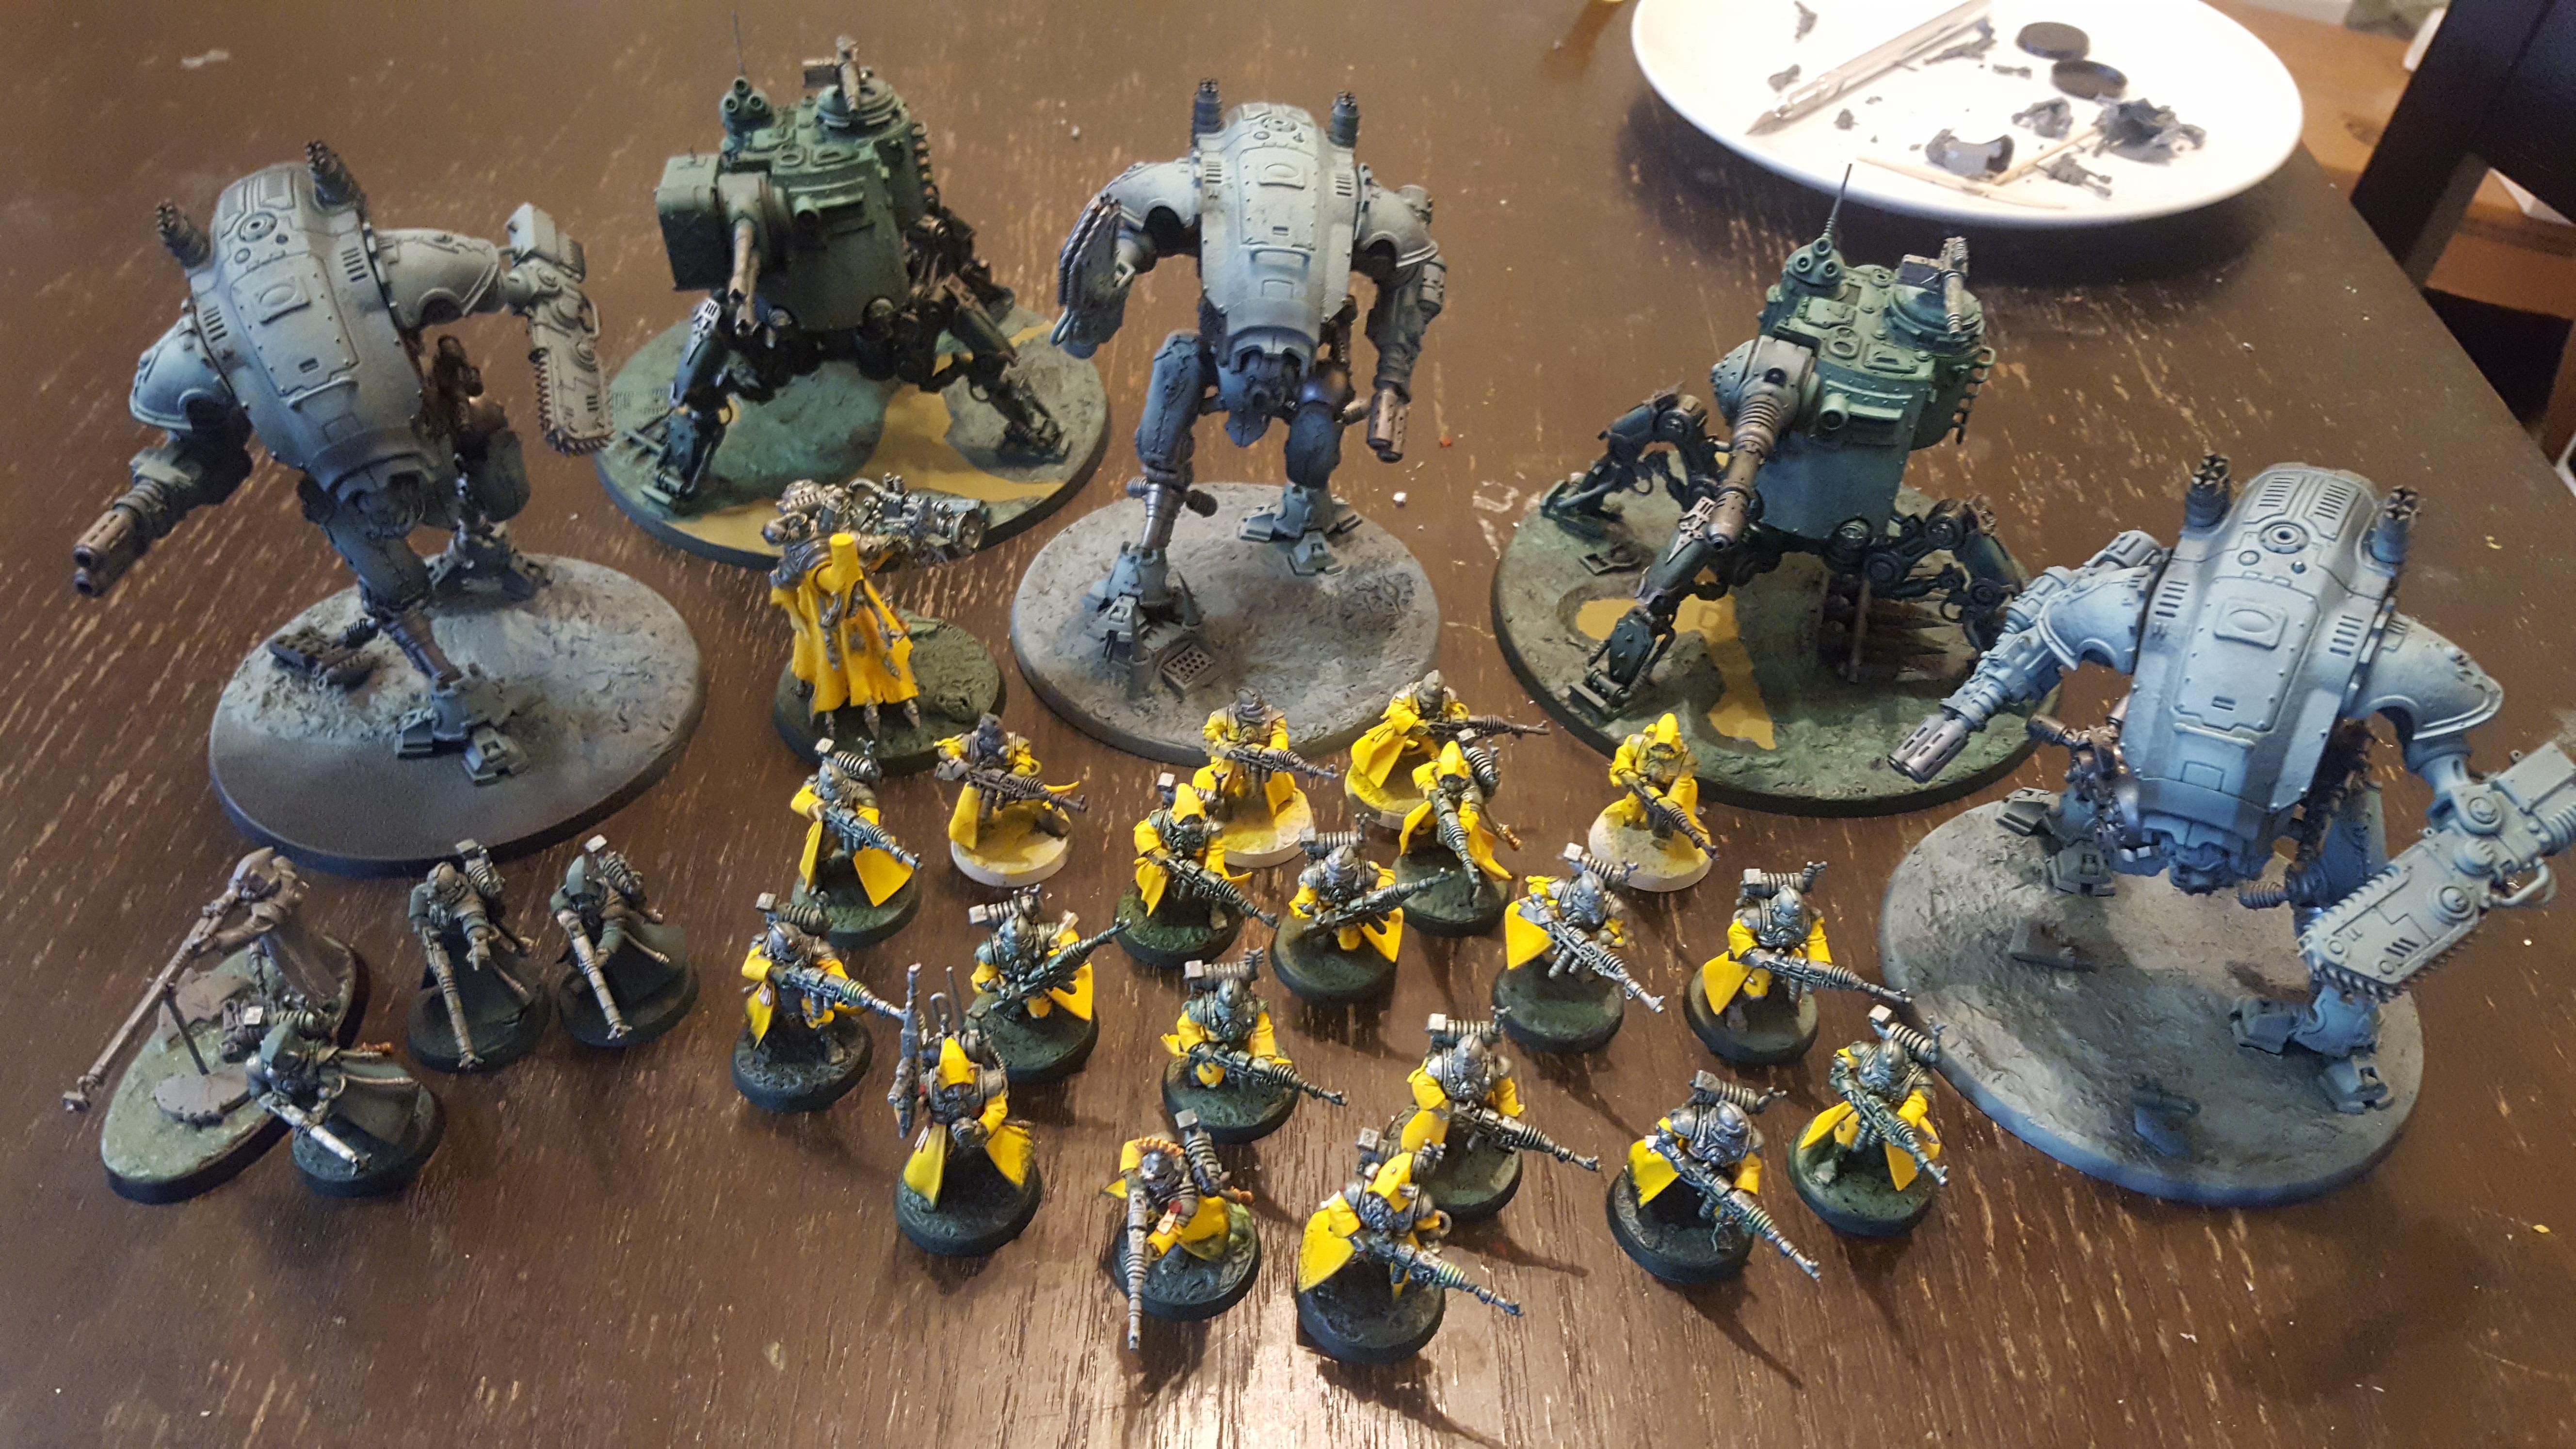 Adeptus Mechanicus, Armiger, Cool, Crusade, Dunecrawler, Dynamic, Imperial Knight, Onager, Pose, Skitarii, Warglaive